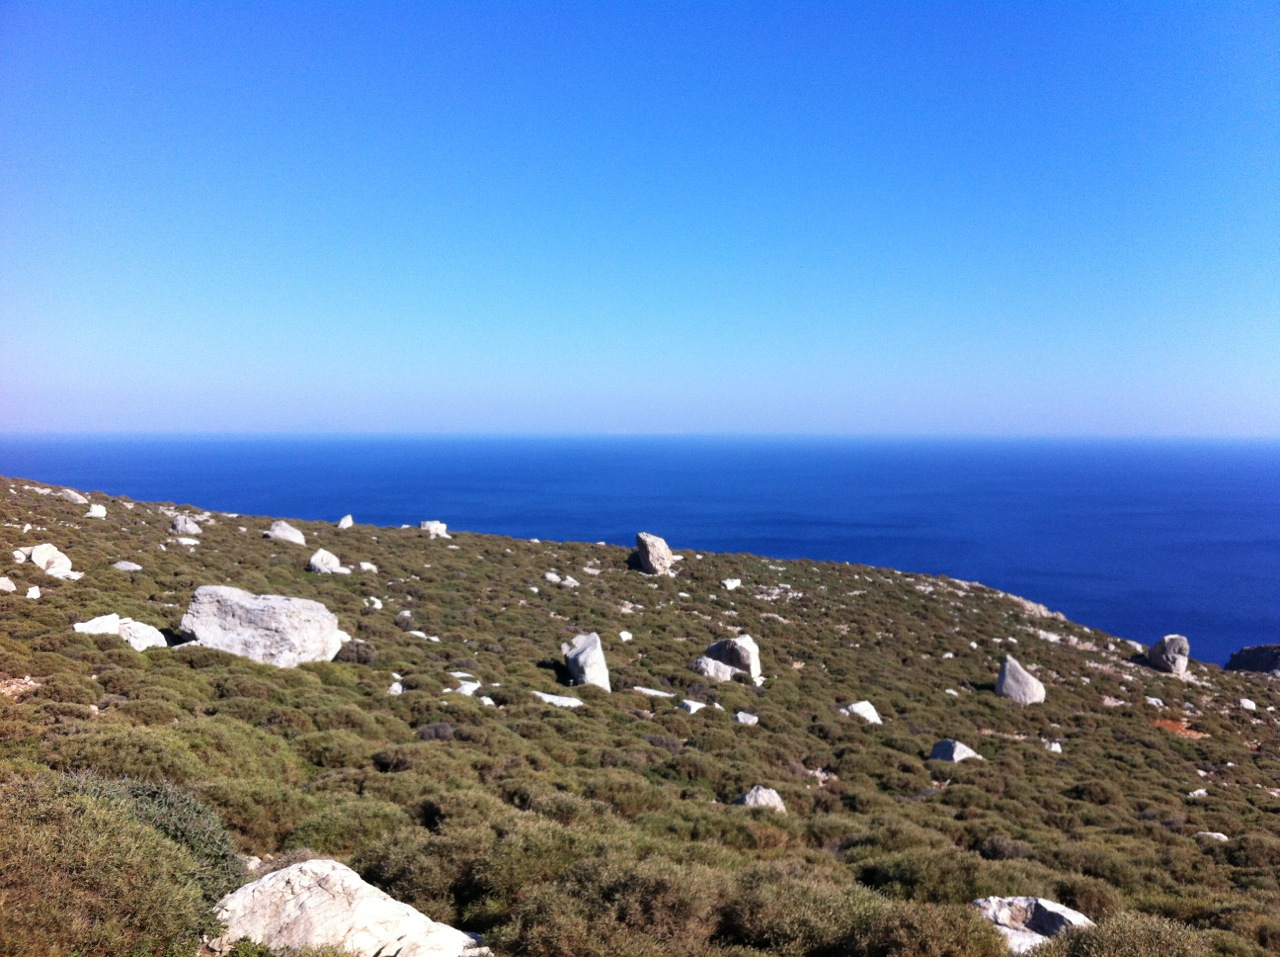 L'arcipelago delle Cicladi Centrali: Paros, Antiparos, Ios e Naxos